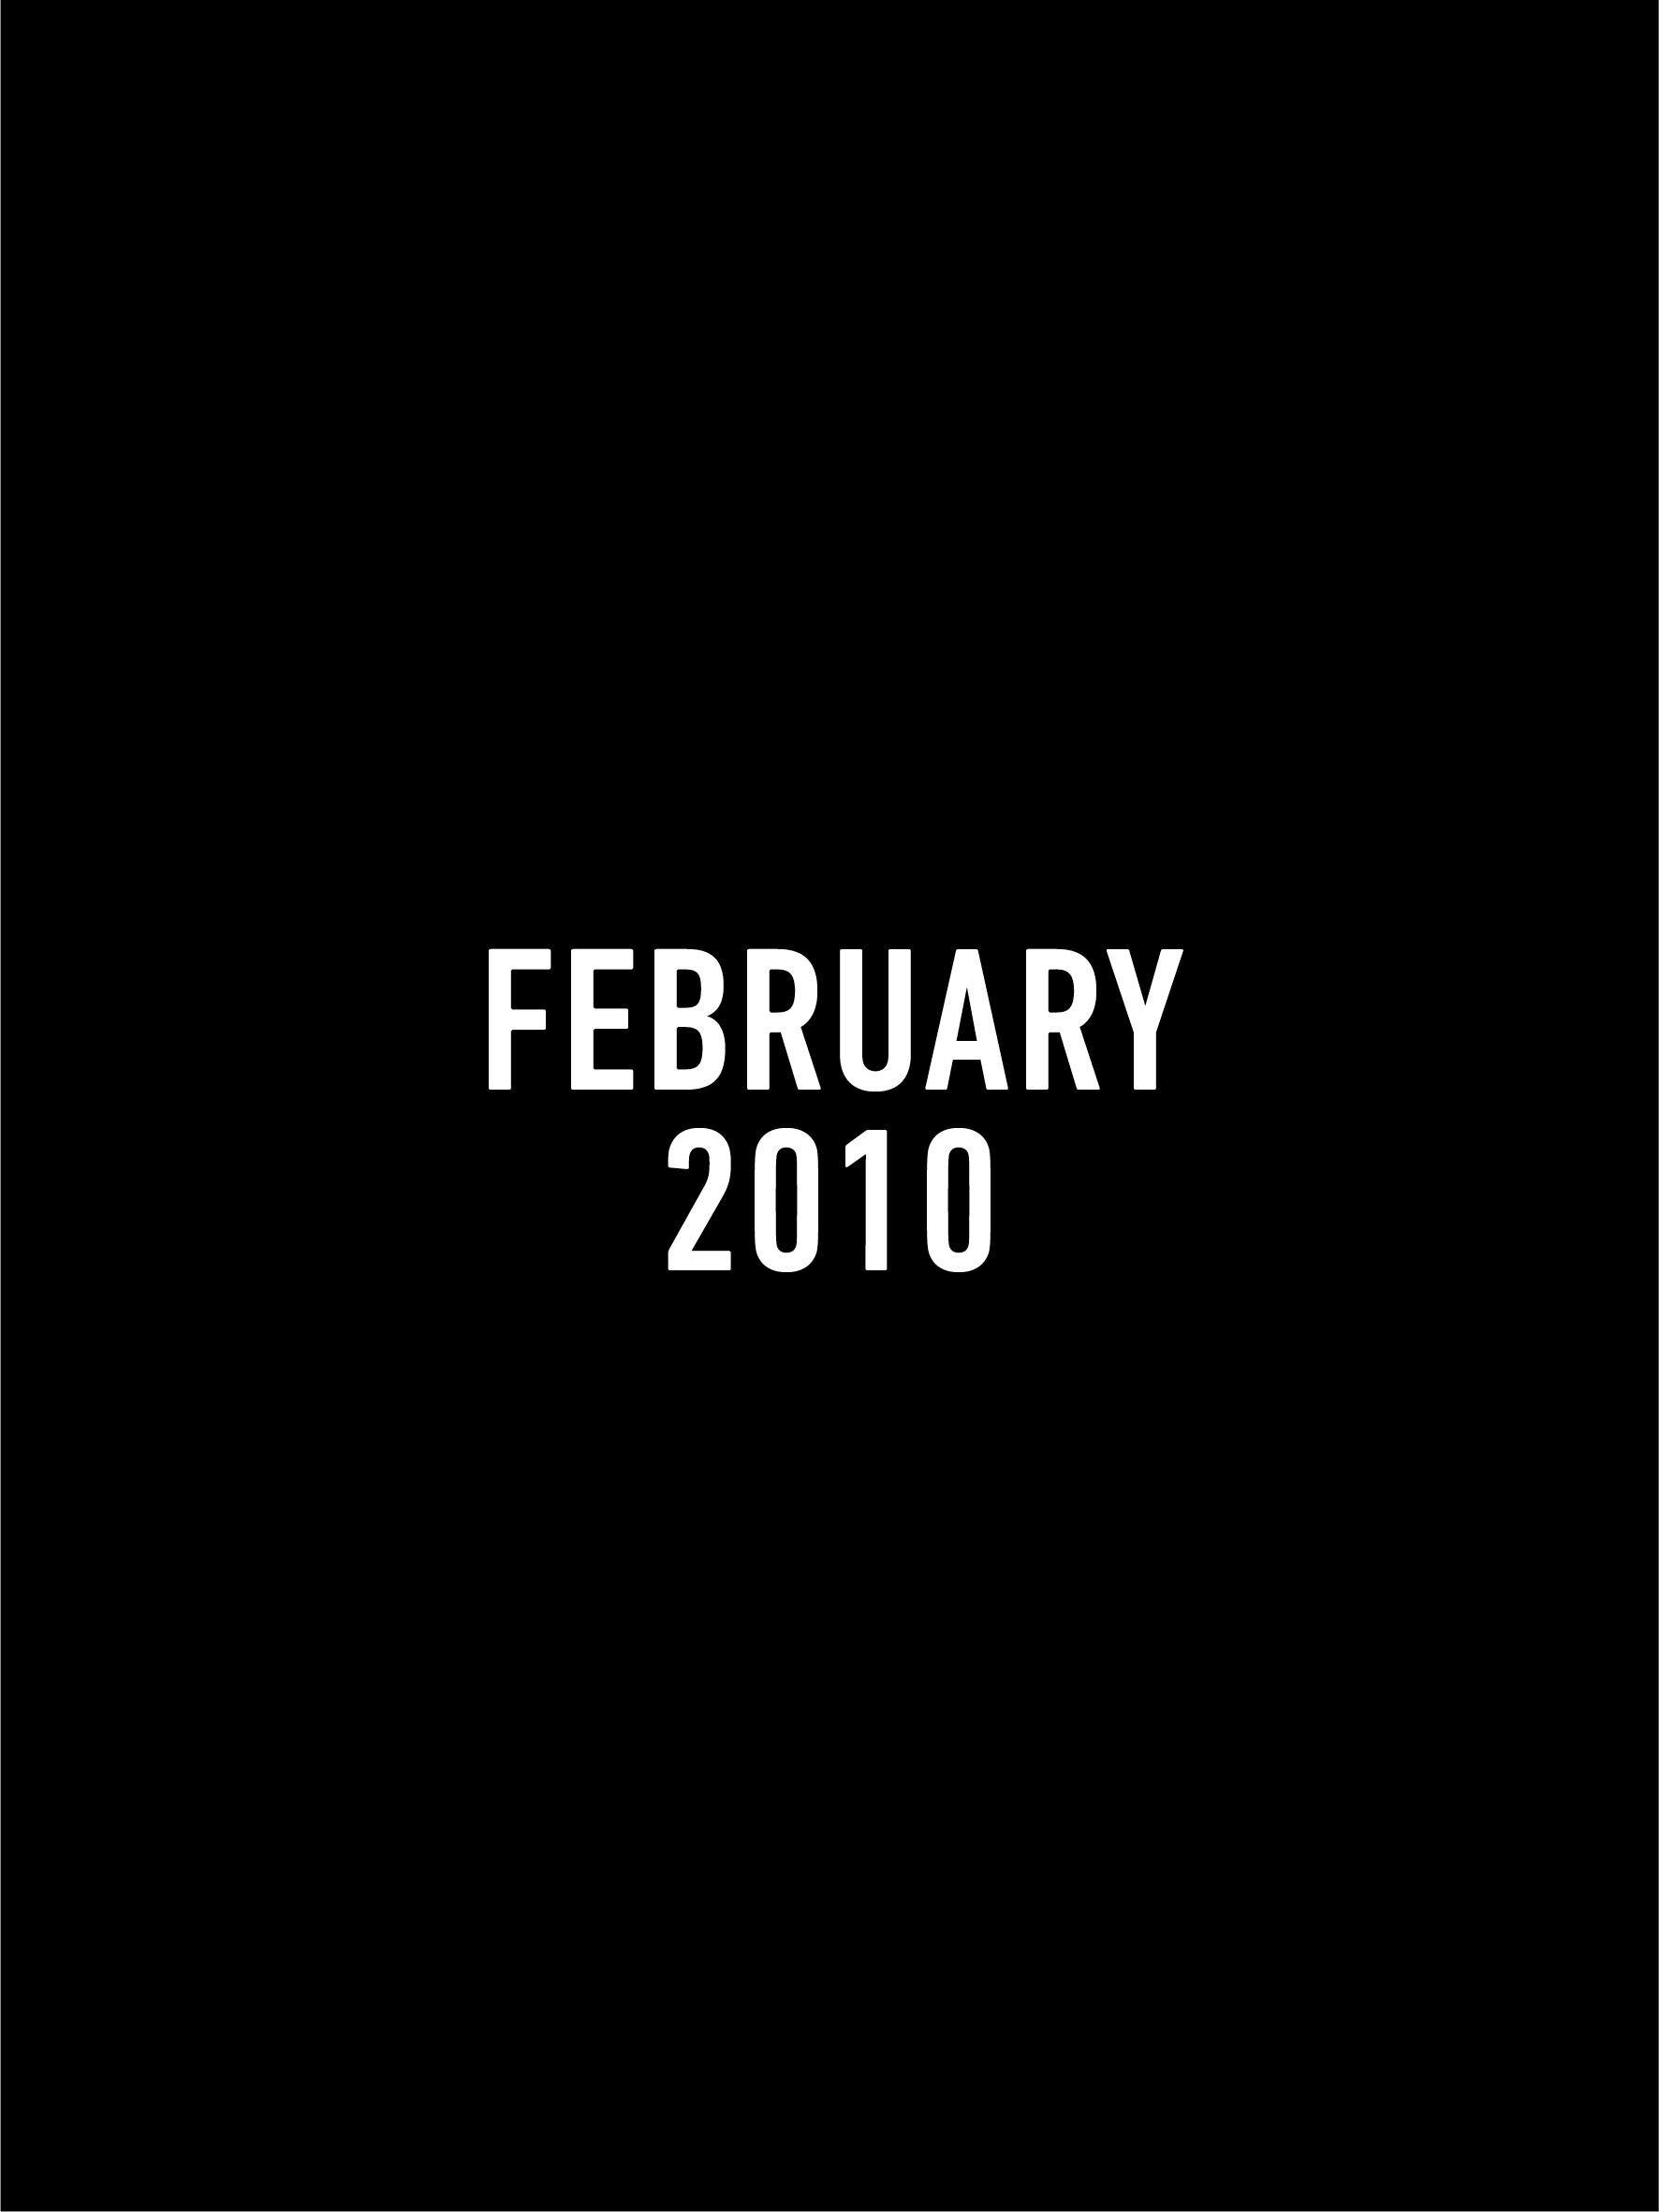 2010 monthly2.jpg